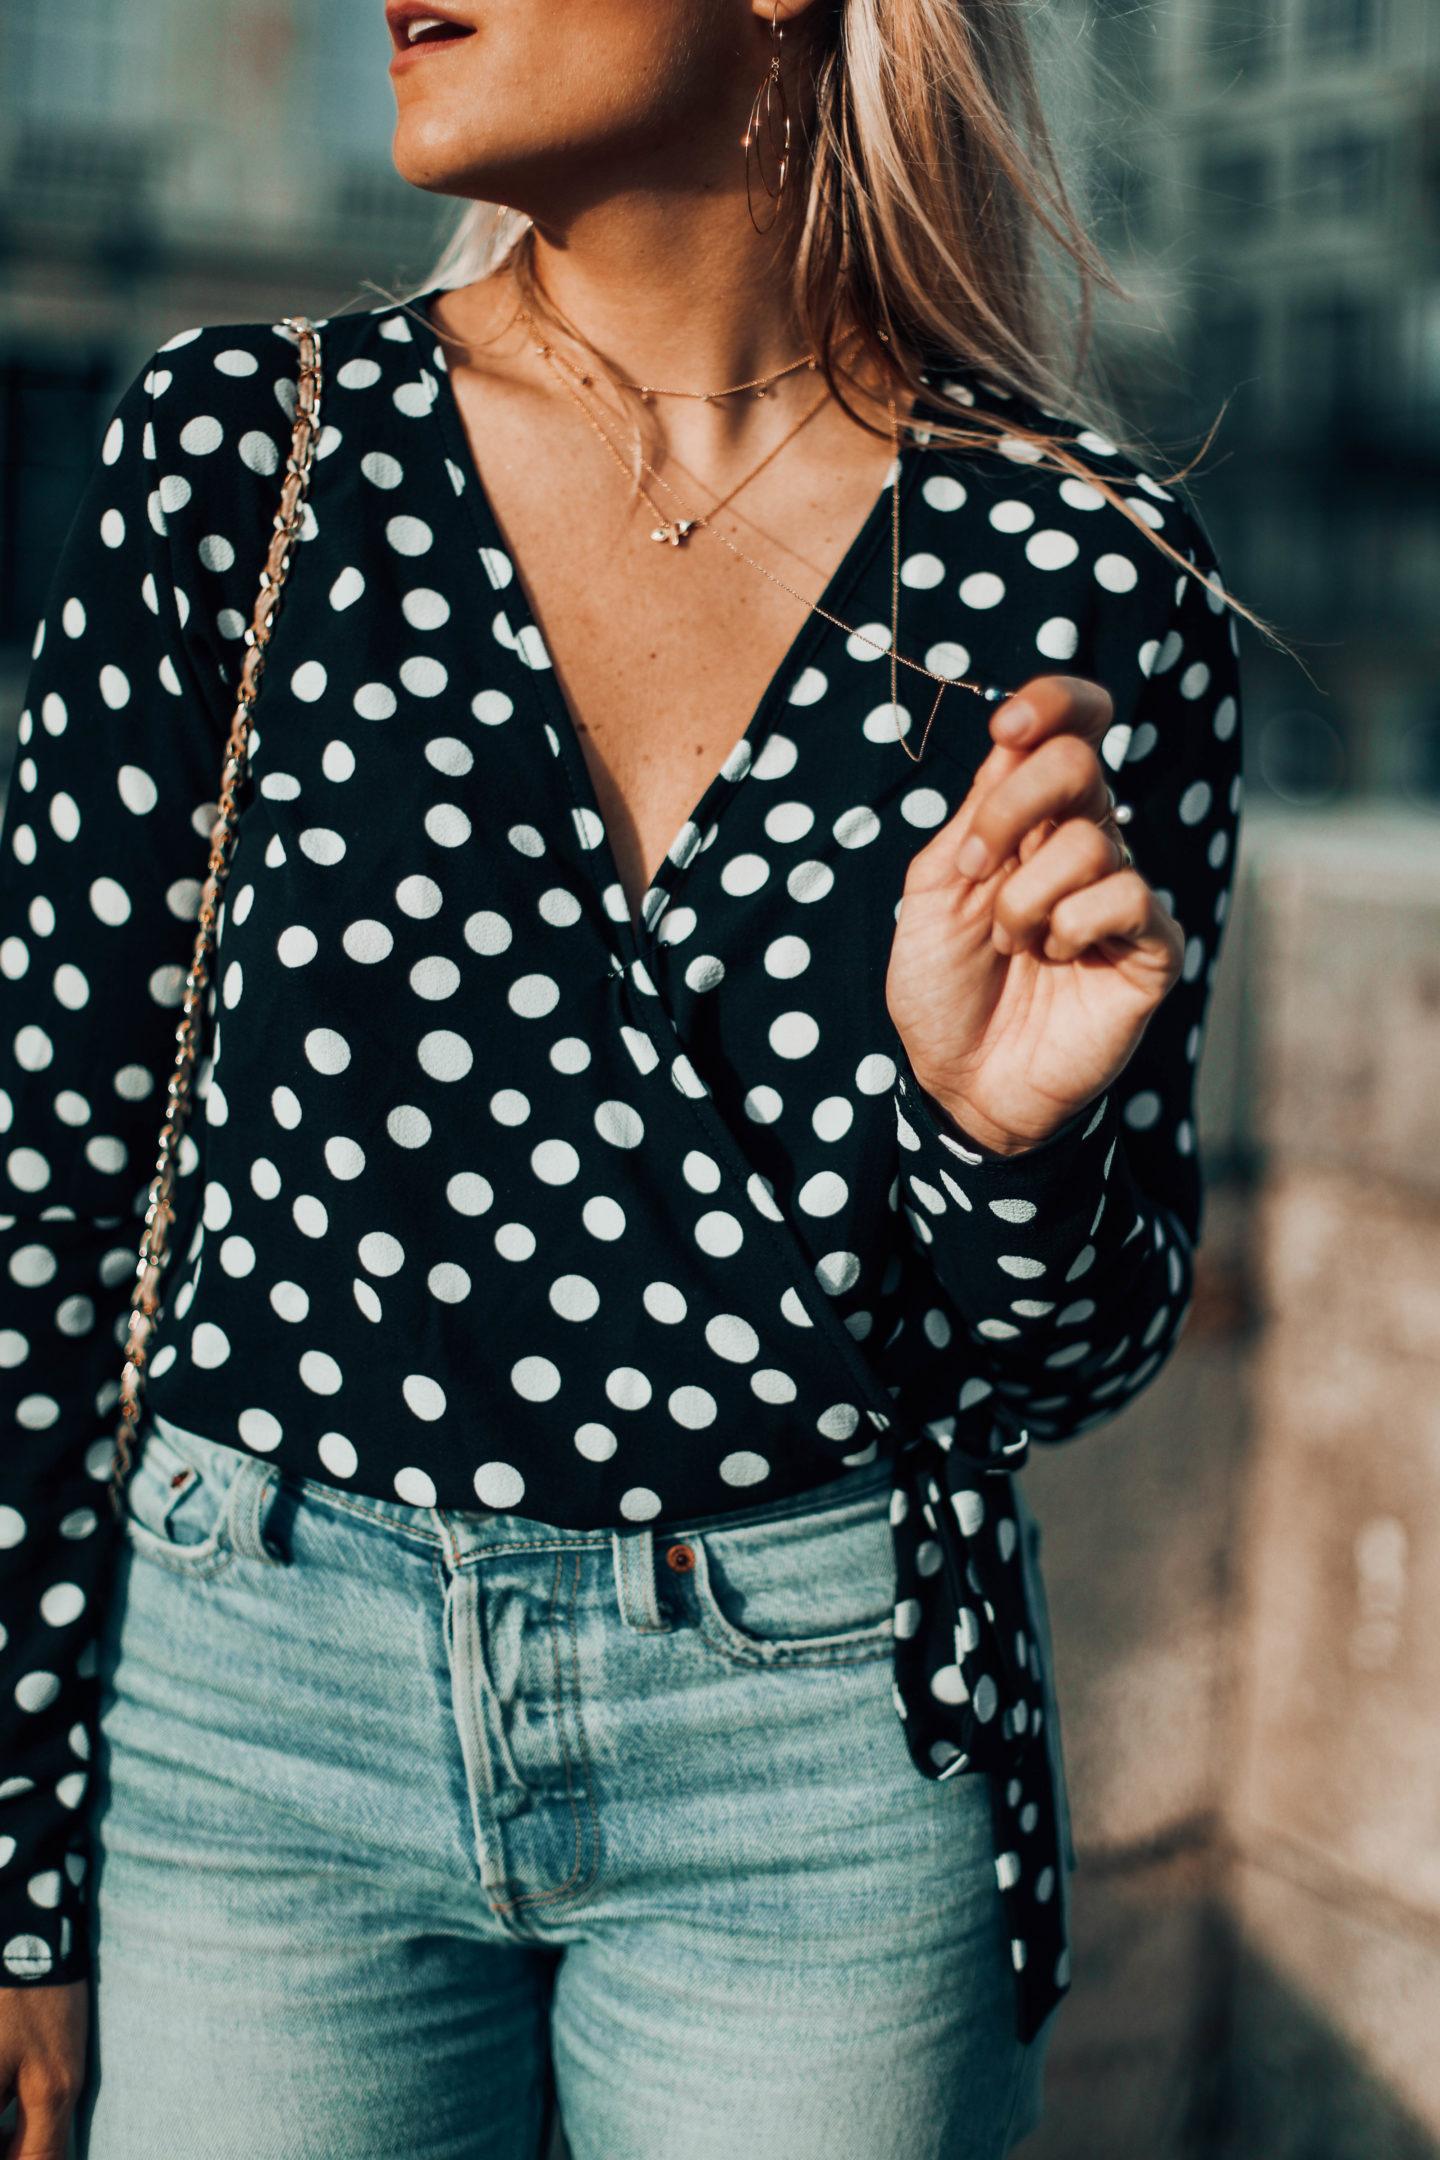 Bijoux Euclide - Blondie Baby blog mode Paris et voyages